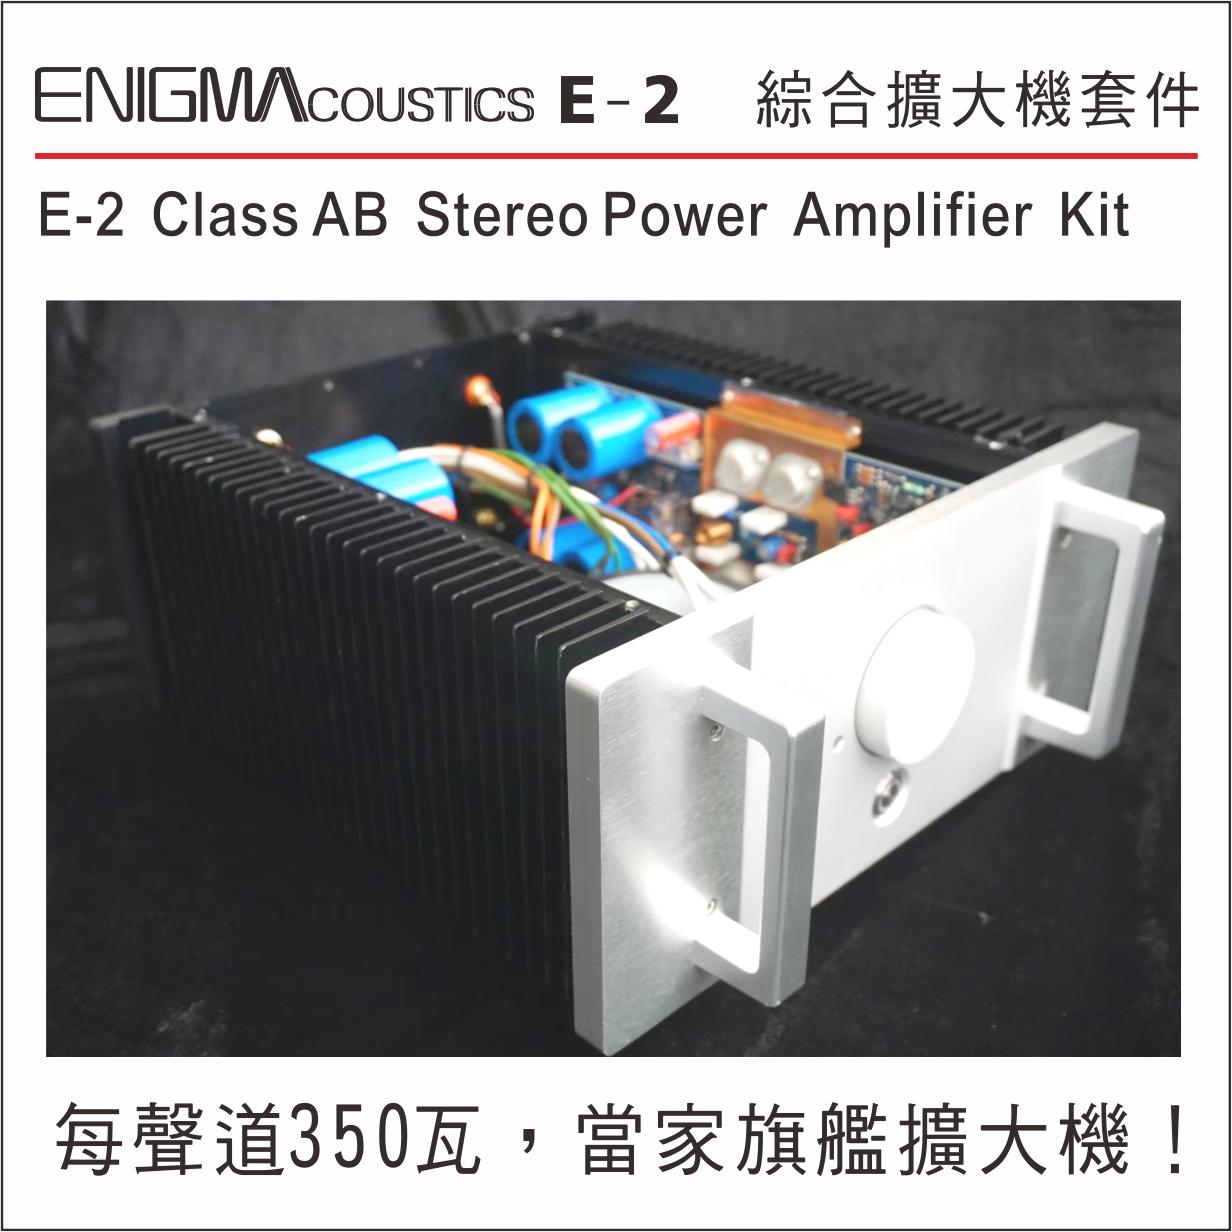 ENIGMA coustics E-2 綜合擴大機套件